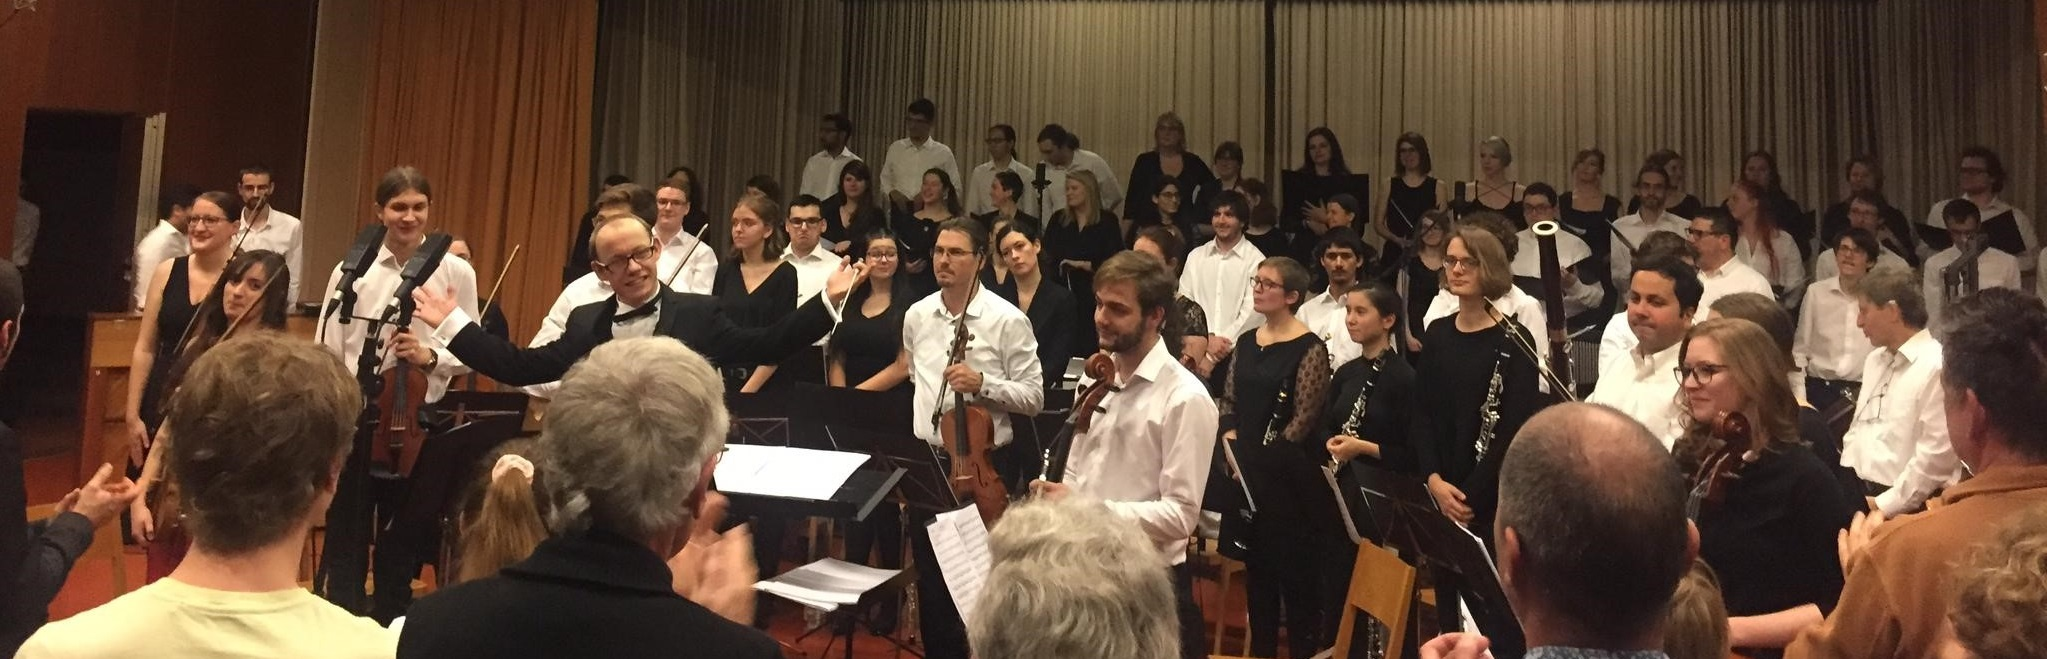 Concert intimiste - Horizontal